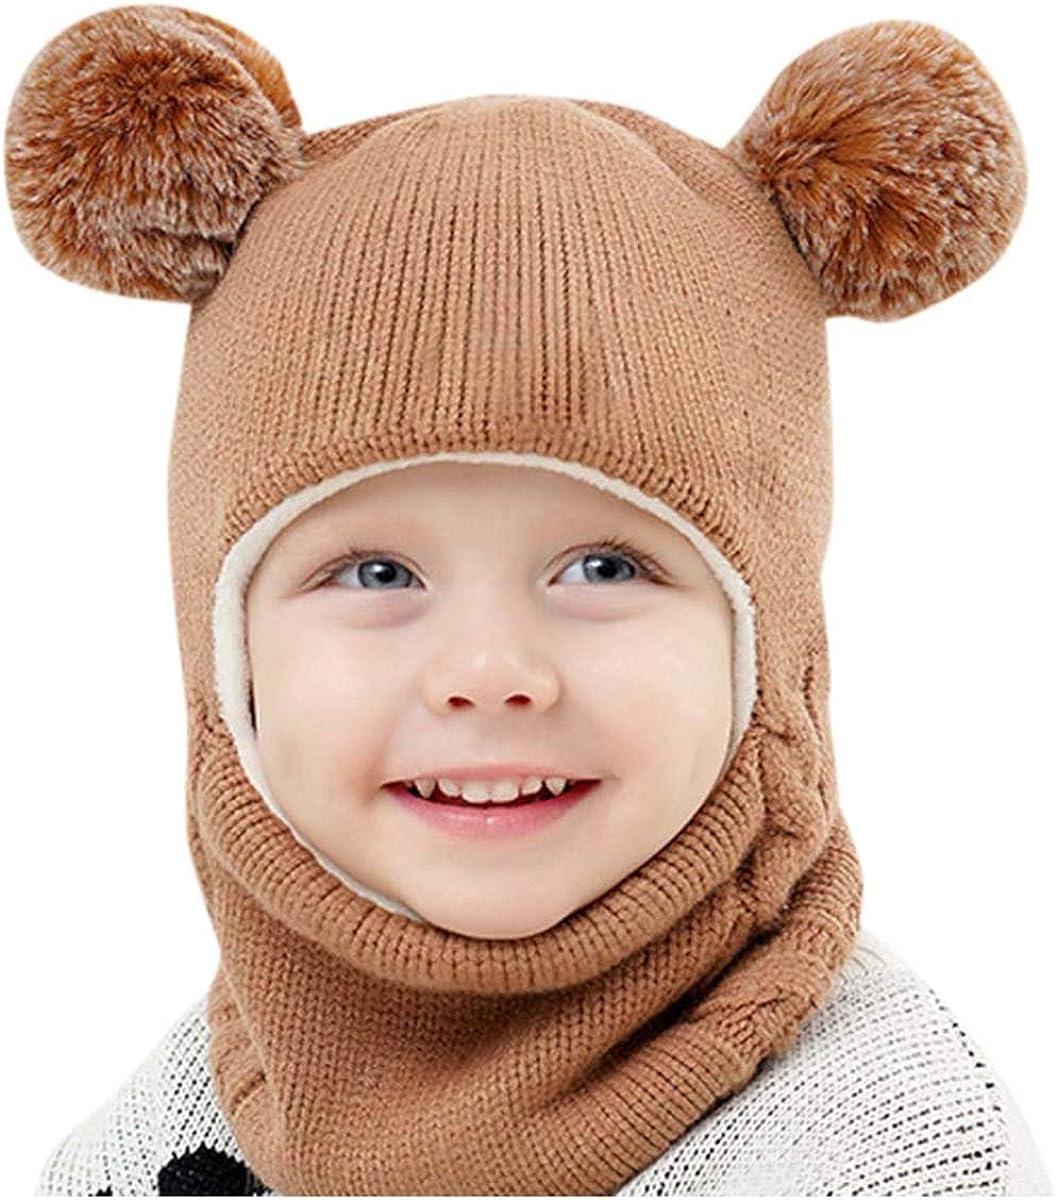 Toddler Baby Kids Boy Girls Warm Knitted Beanie Cap Winter Hat Scarf Set Earflap